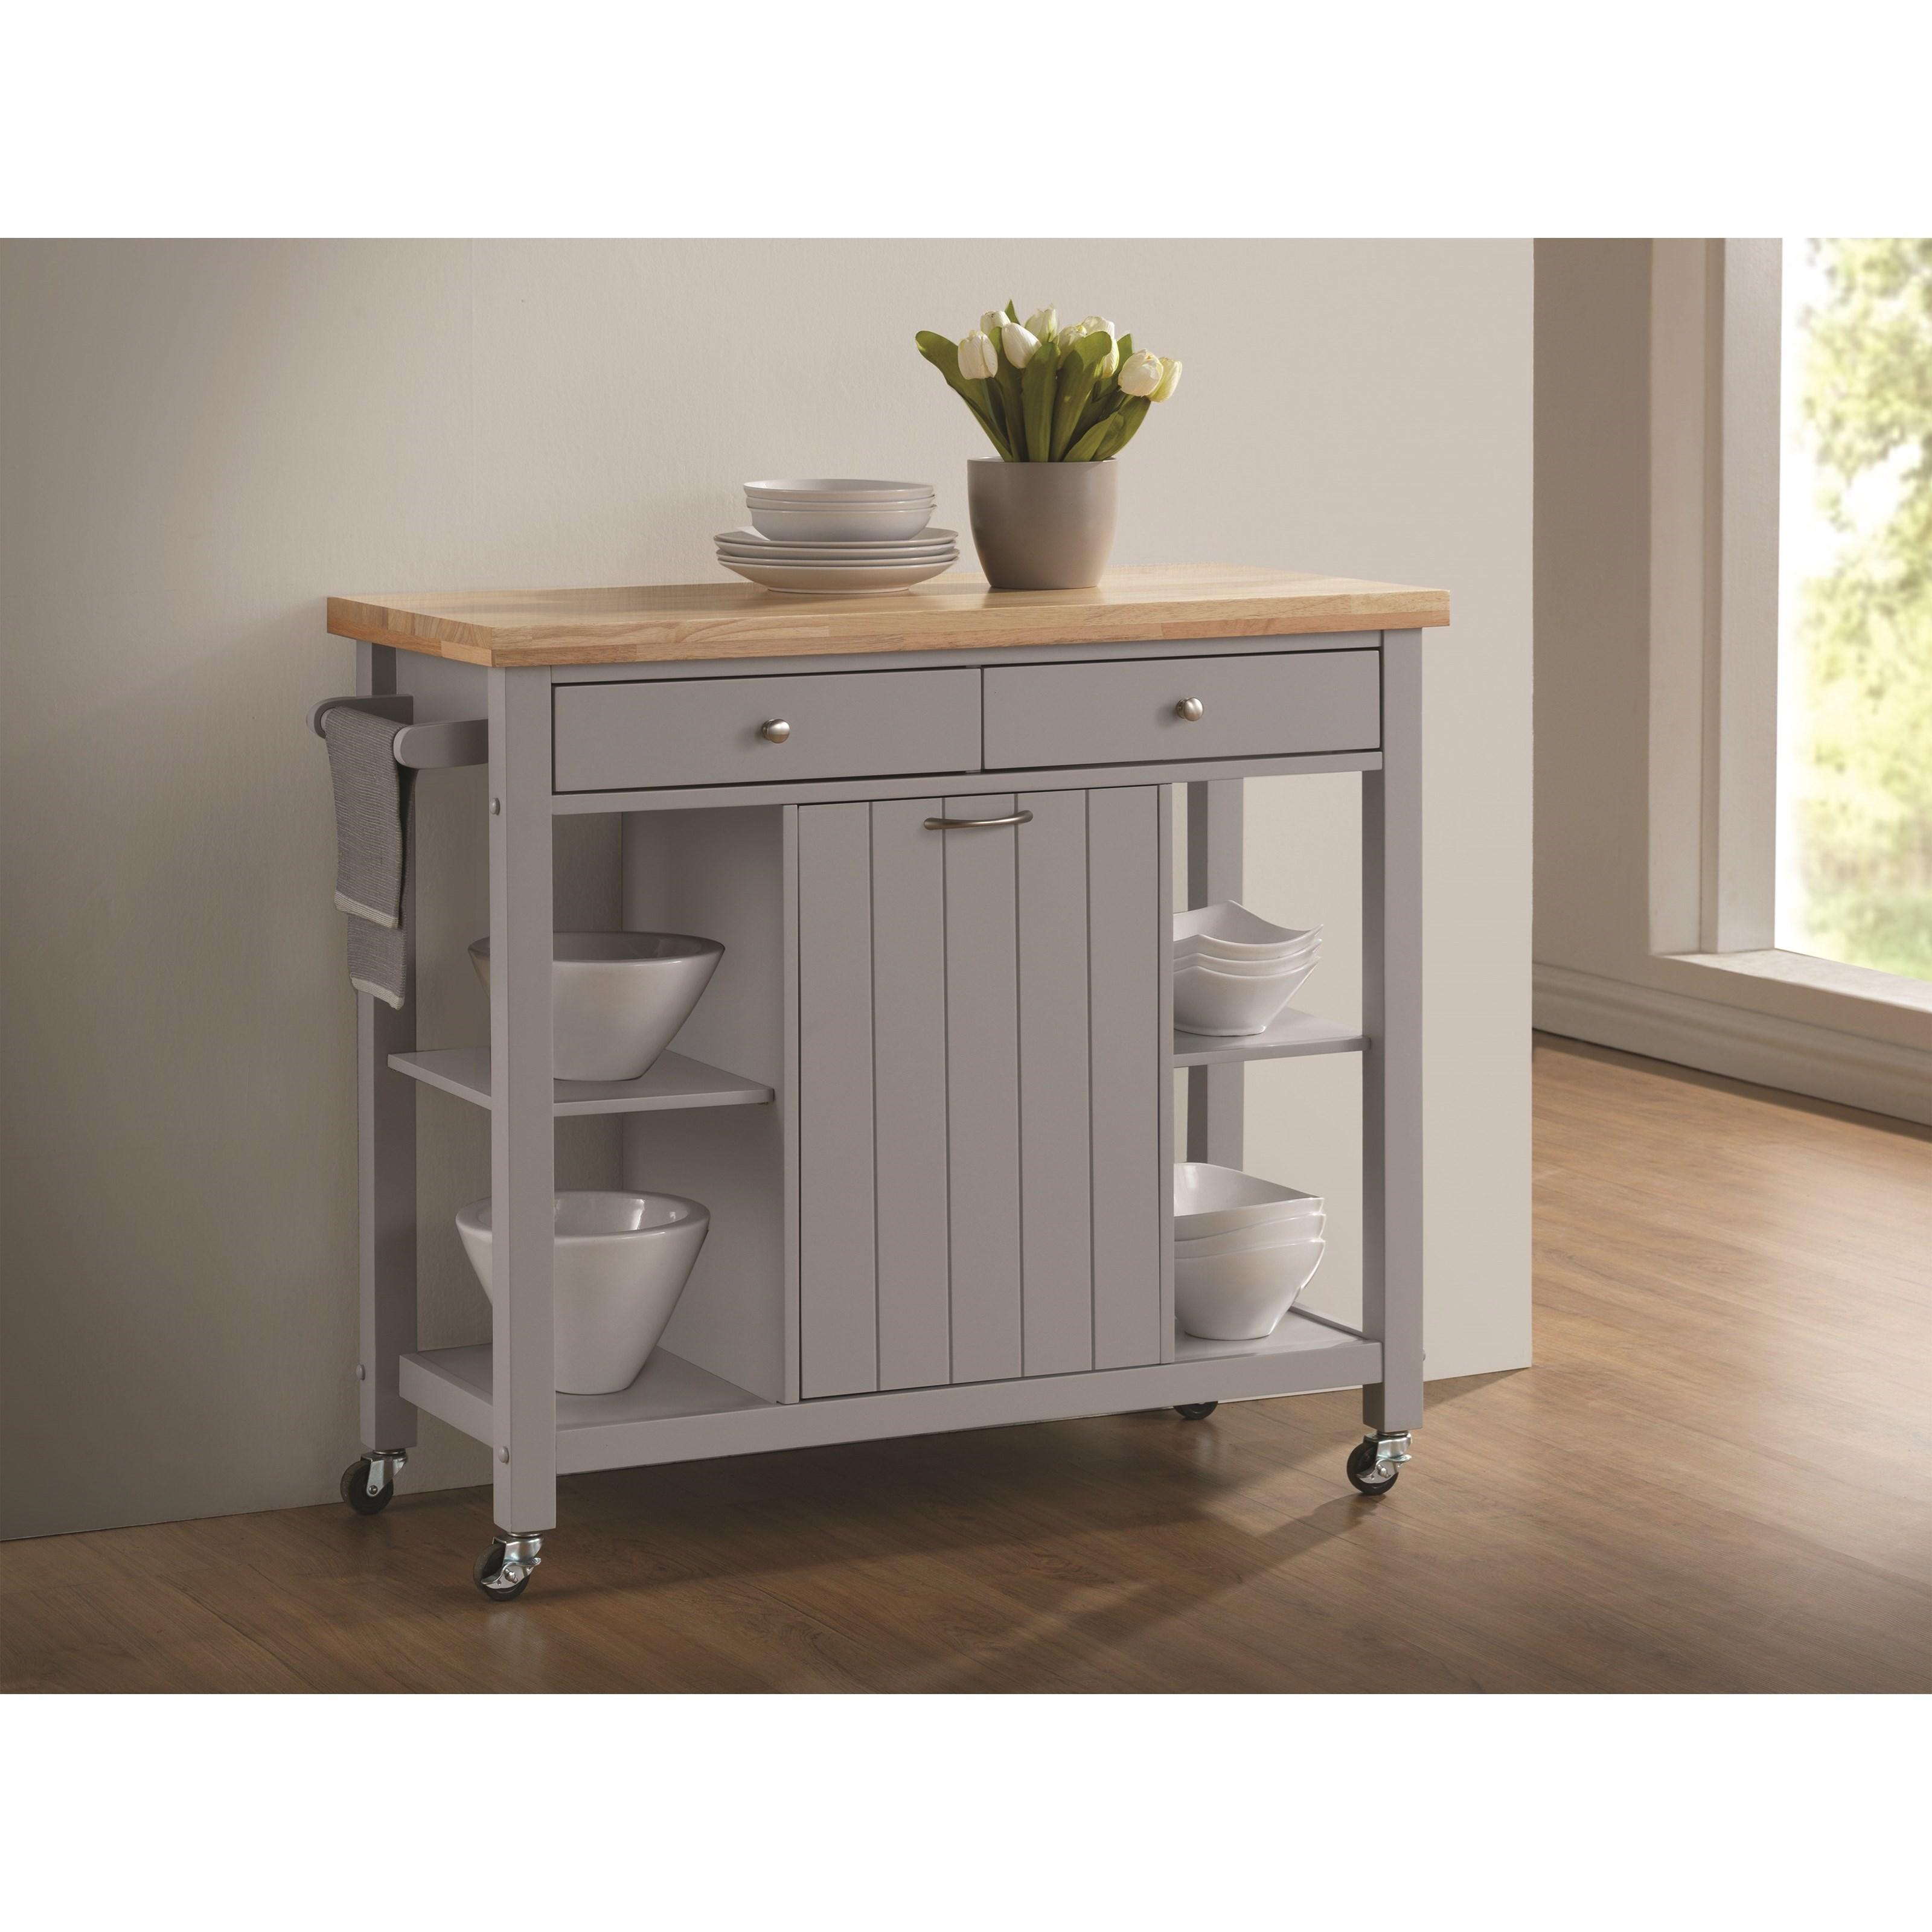 Coaster Kitchen Carts Kitchen Island - Item Number: 102674